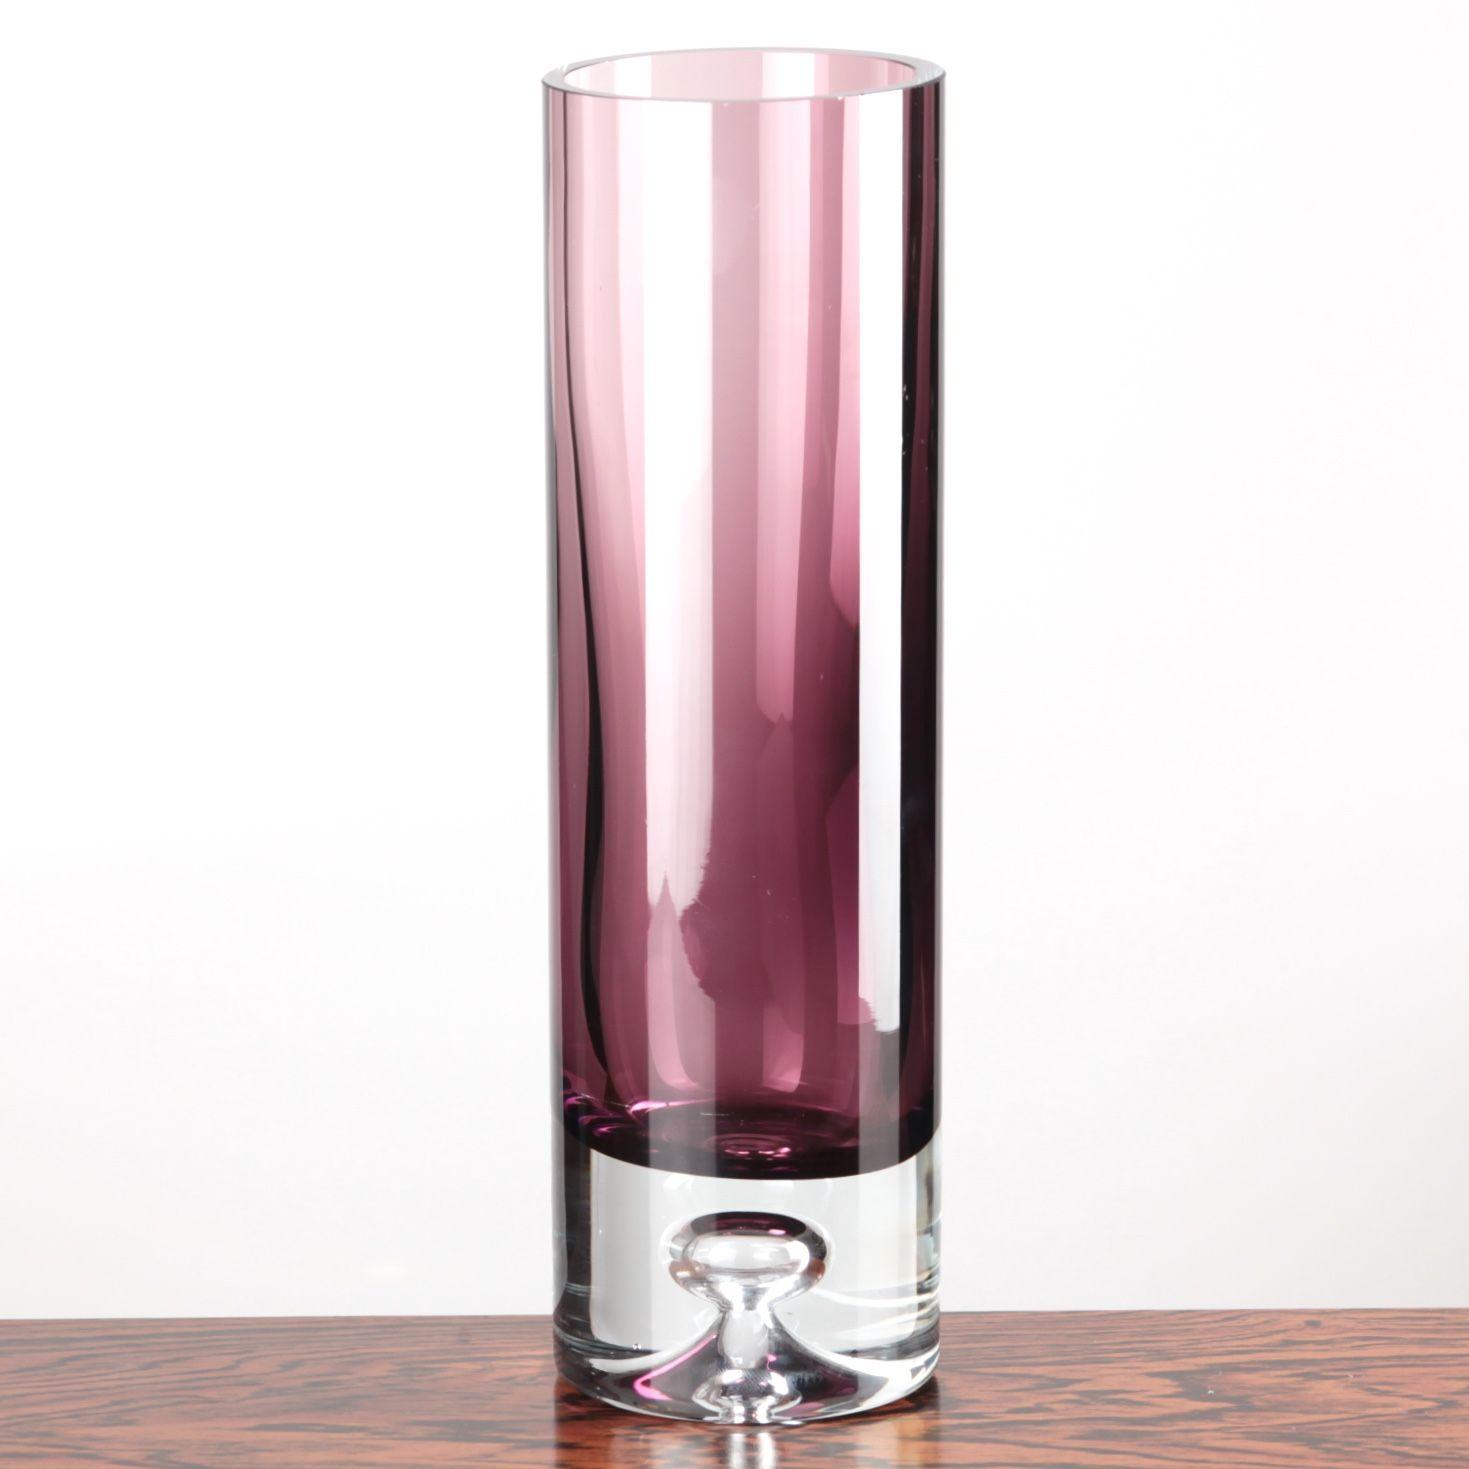 Iittala Glas Vase Lila Design Tapio Wirkkala 25 Cm Hoch